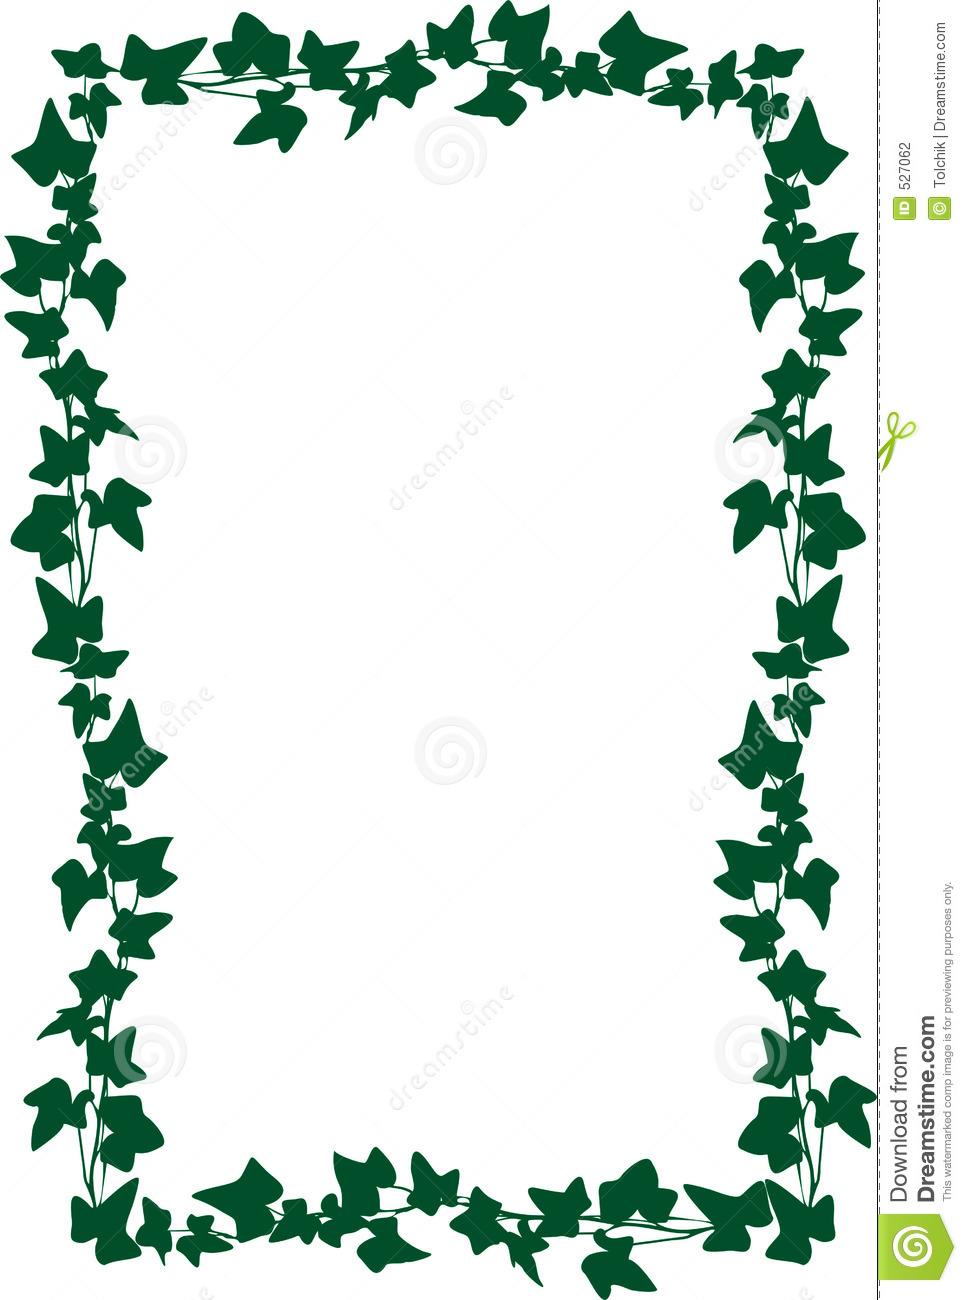 967x1300 Free Ivy Vine Clipart